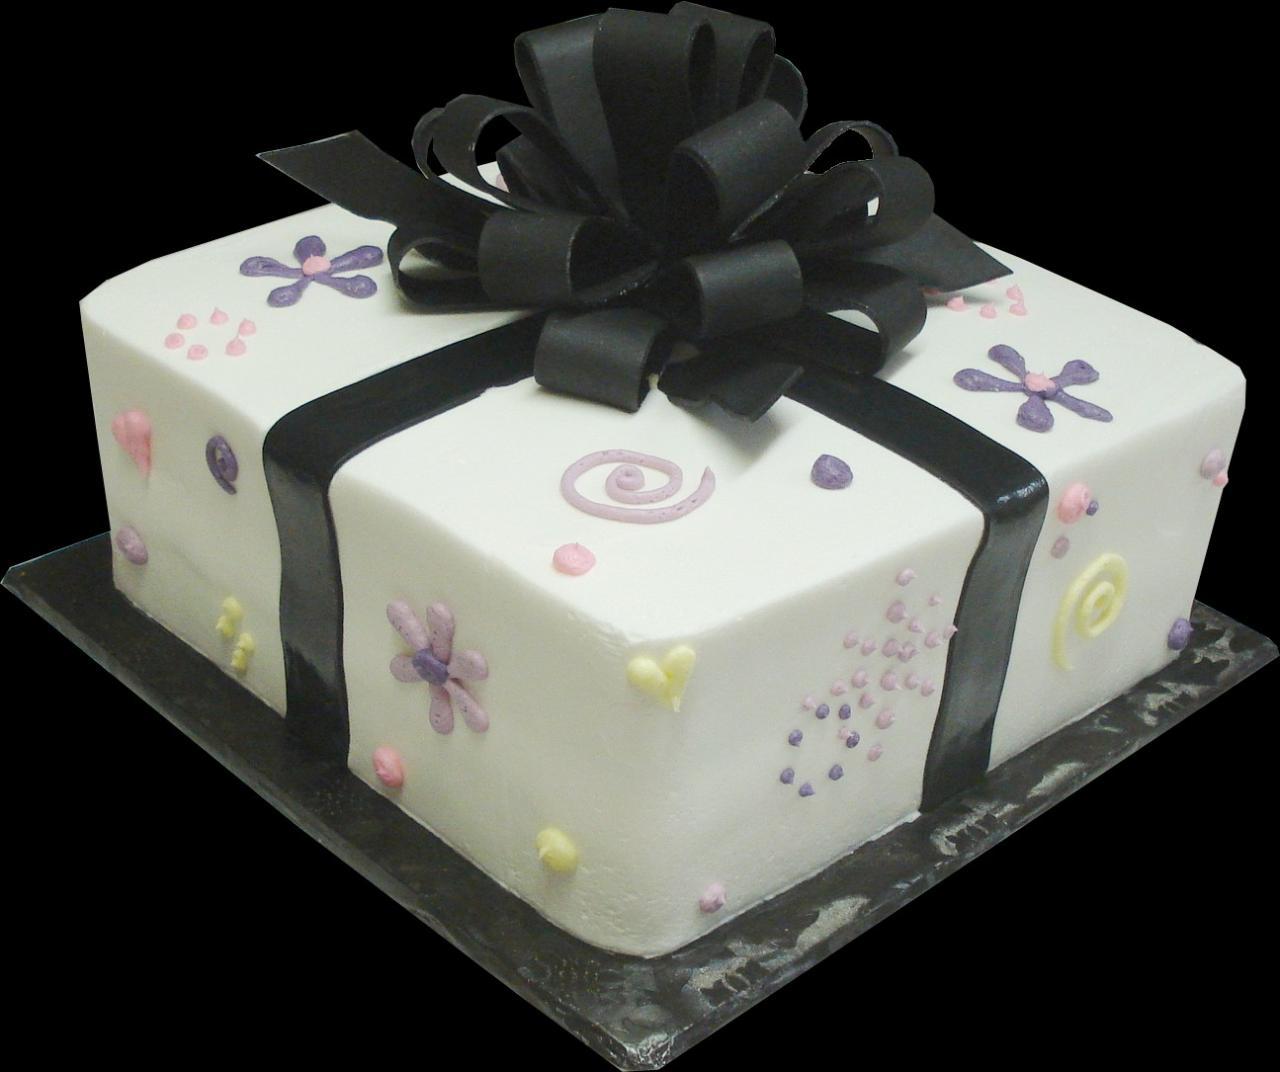 8 Square Birthday Cakes With Bows Photo Square Birthday Cake